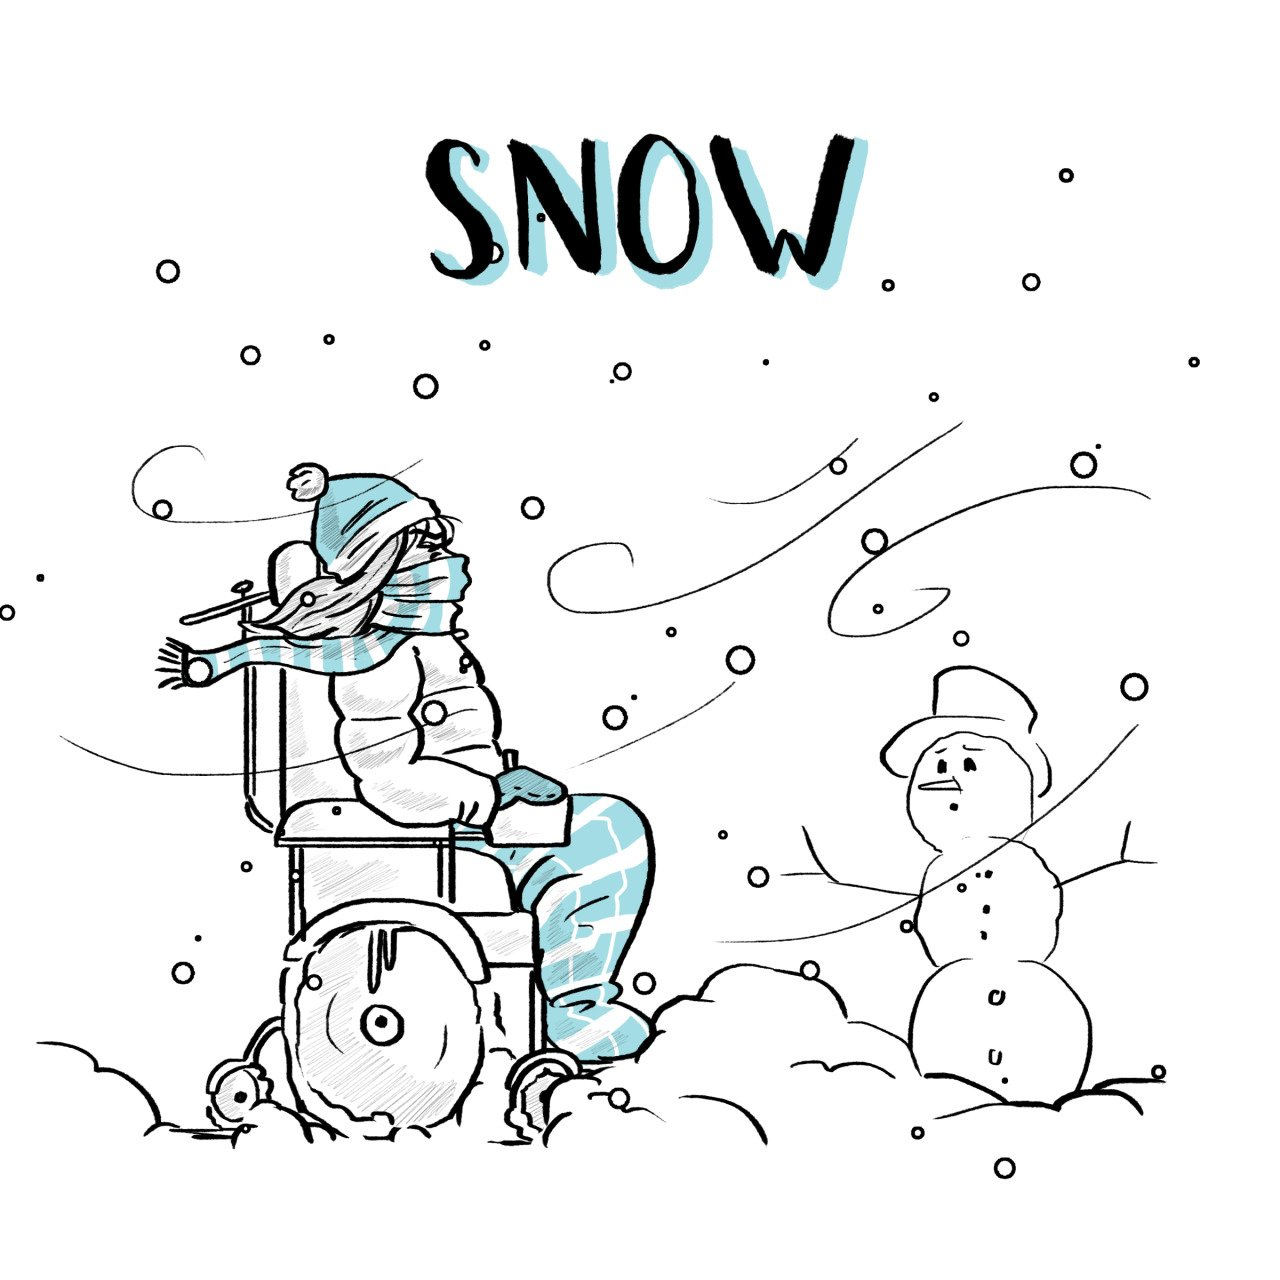 Dec 1. Winter is coming. Prepare people #shovel #thedisabledlife https://t.co/XgJUzqEz1f